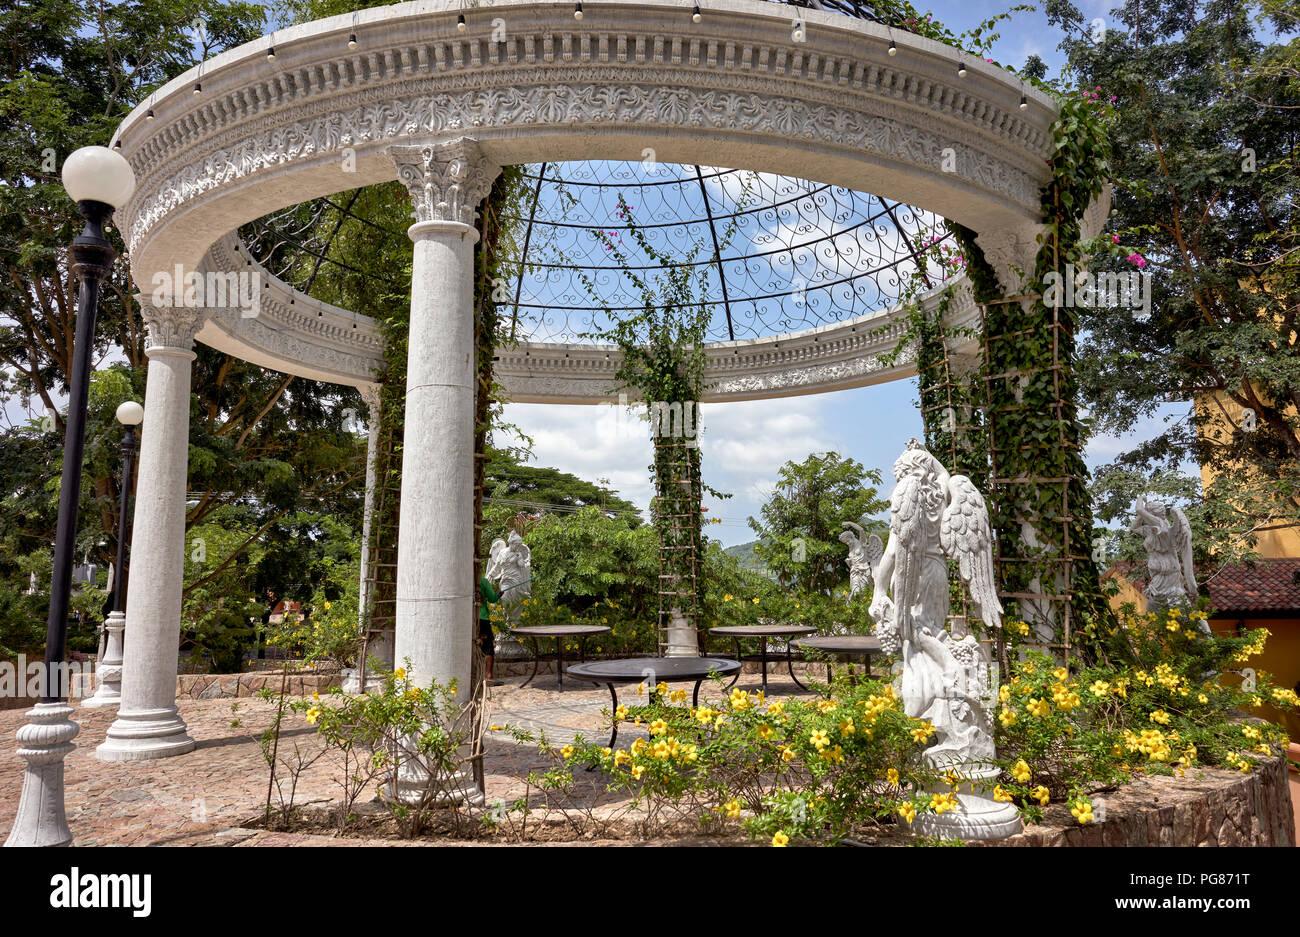 Garden Gazebo Built In An Ornate Round Stone Traditional Italian Style